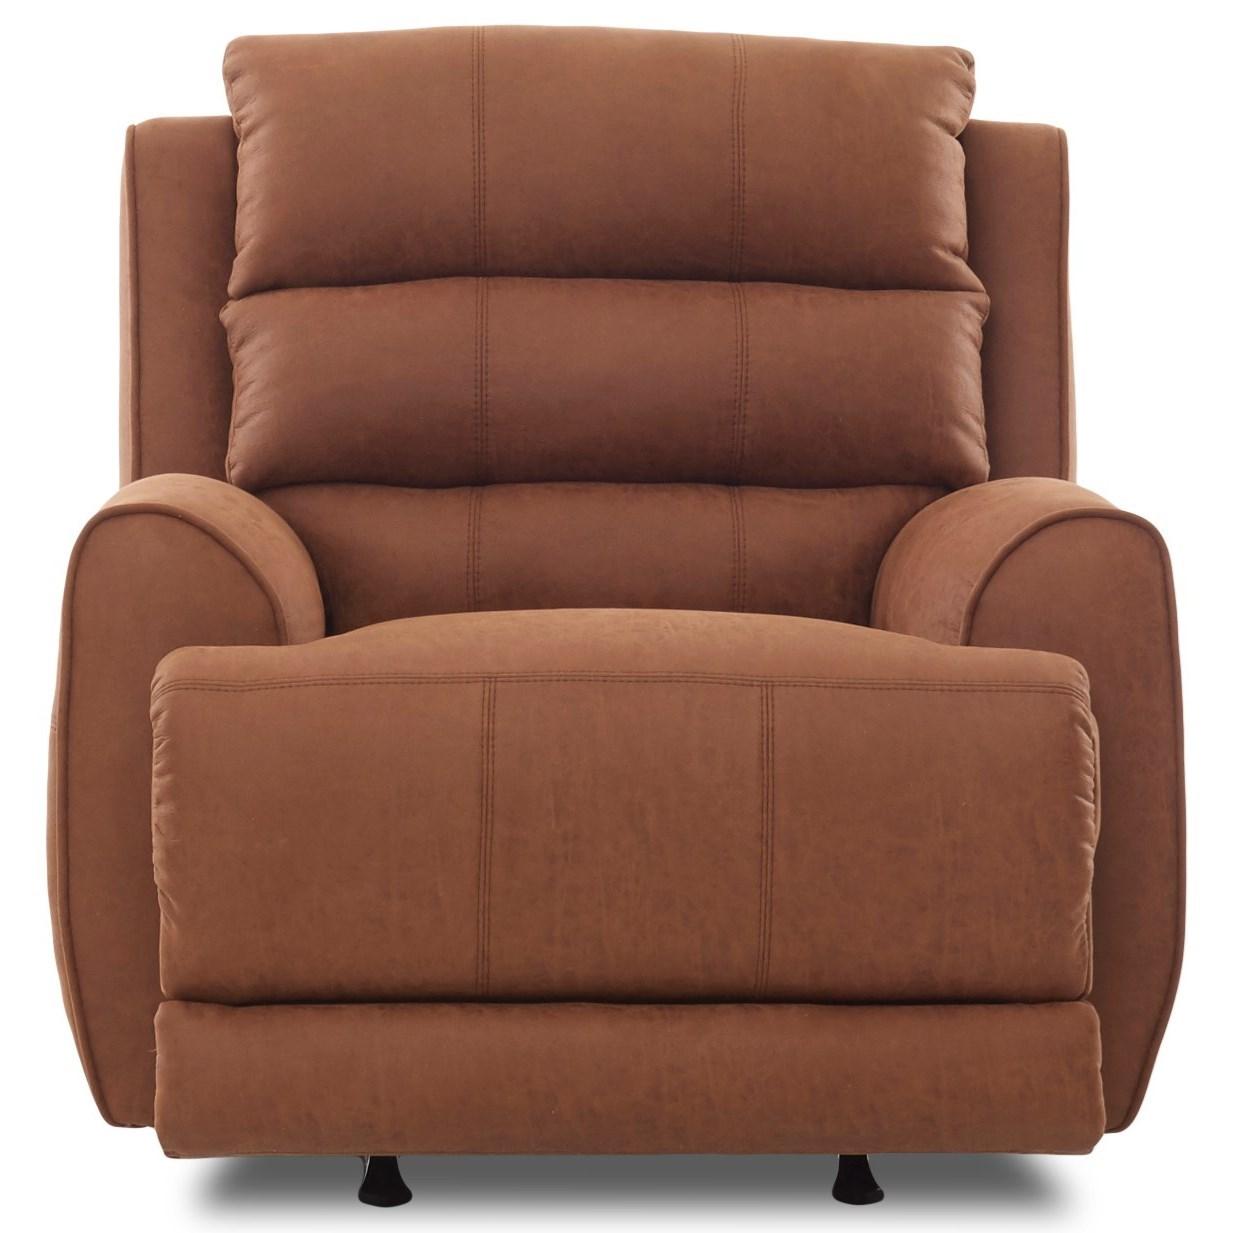 Power Rock Reclining Chair w/ Pwr Head/Lumb